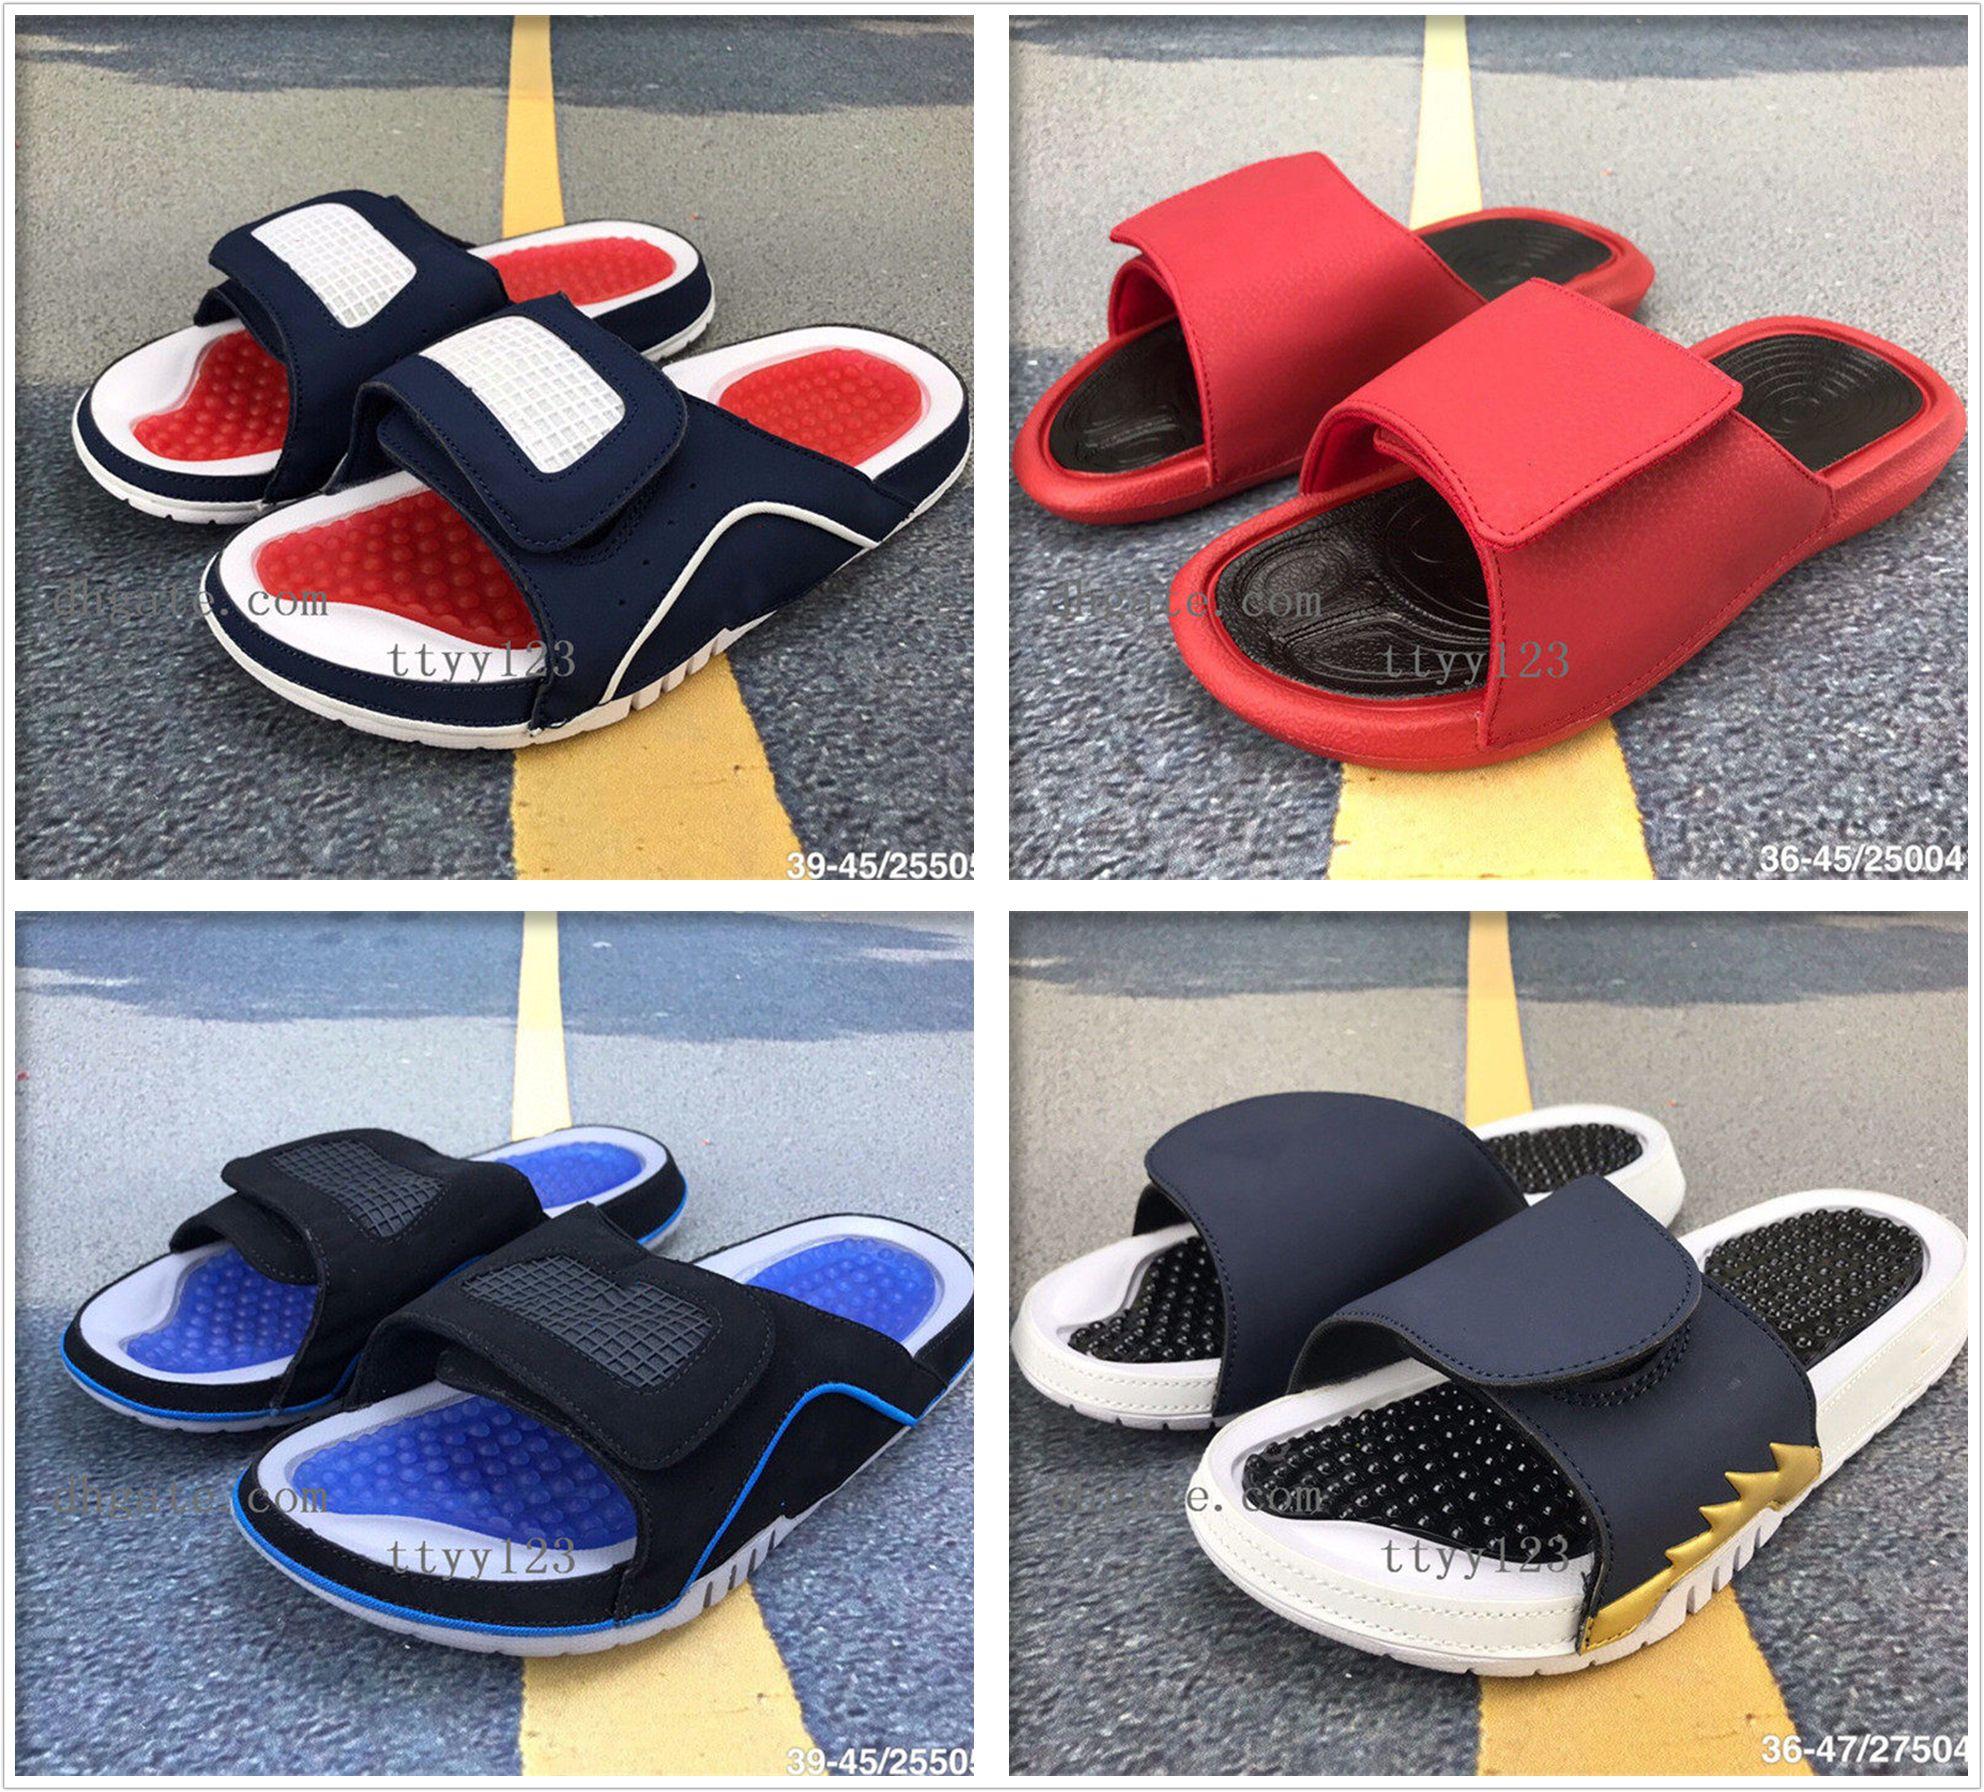 20ss Slipper 6 Sandalen Flamme 4 Tarnung Multicolor Massage 7 Slippers 5s Rot Weiß Schwarz Slides Schuhe Outdoor-beiläufige Sport-Slipper 36-45